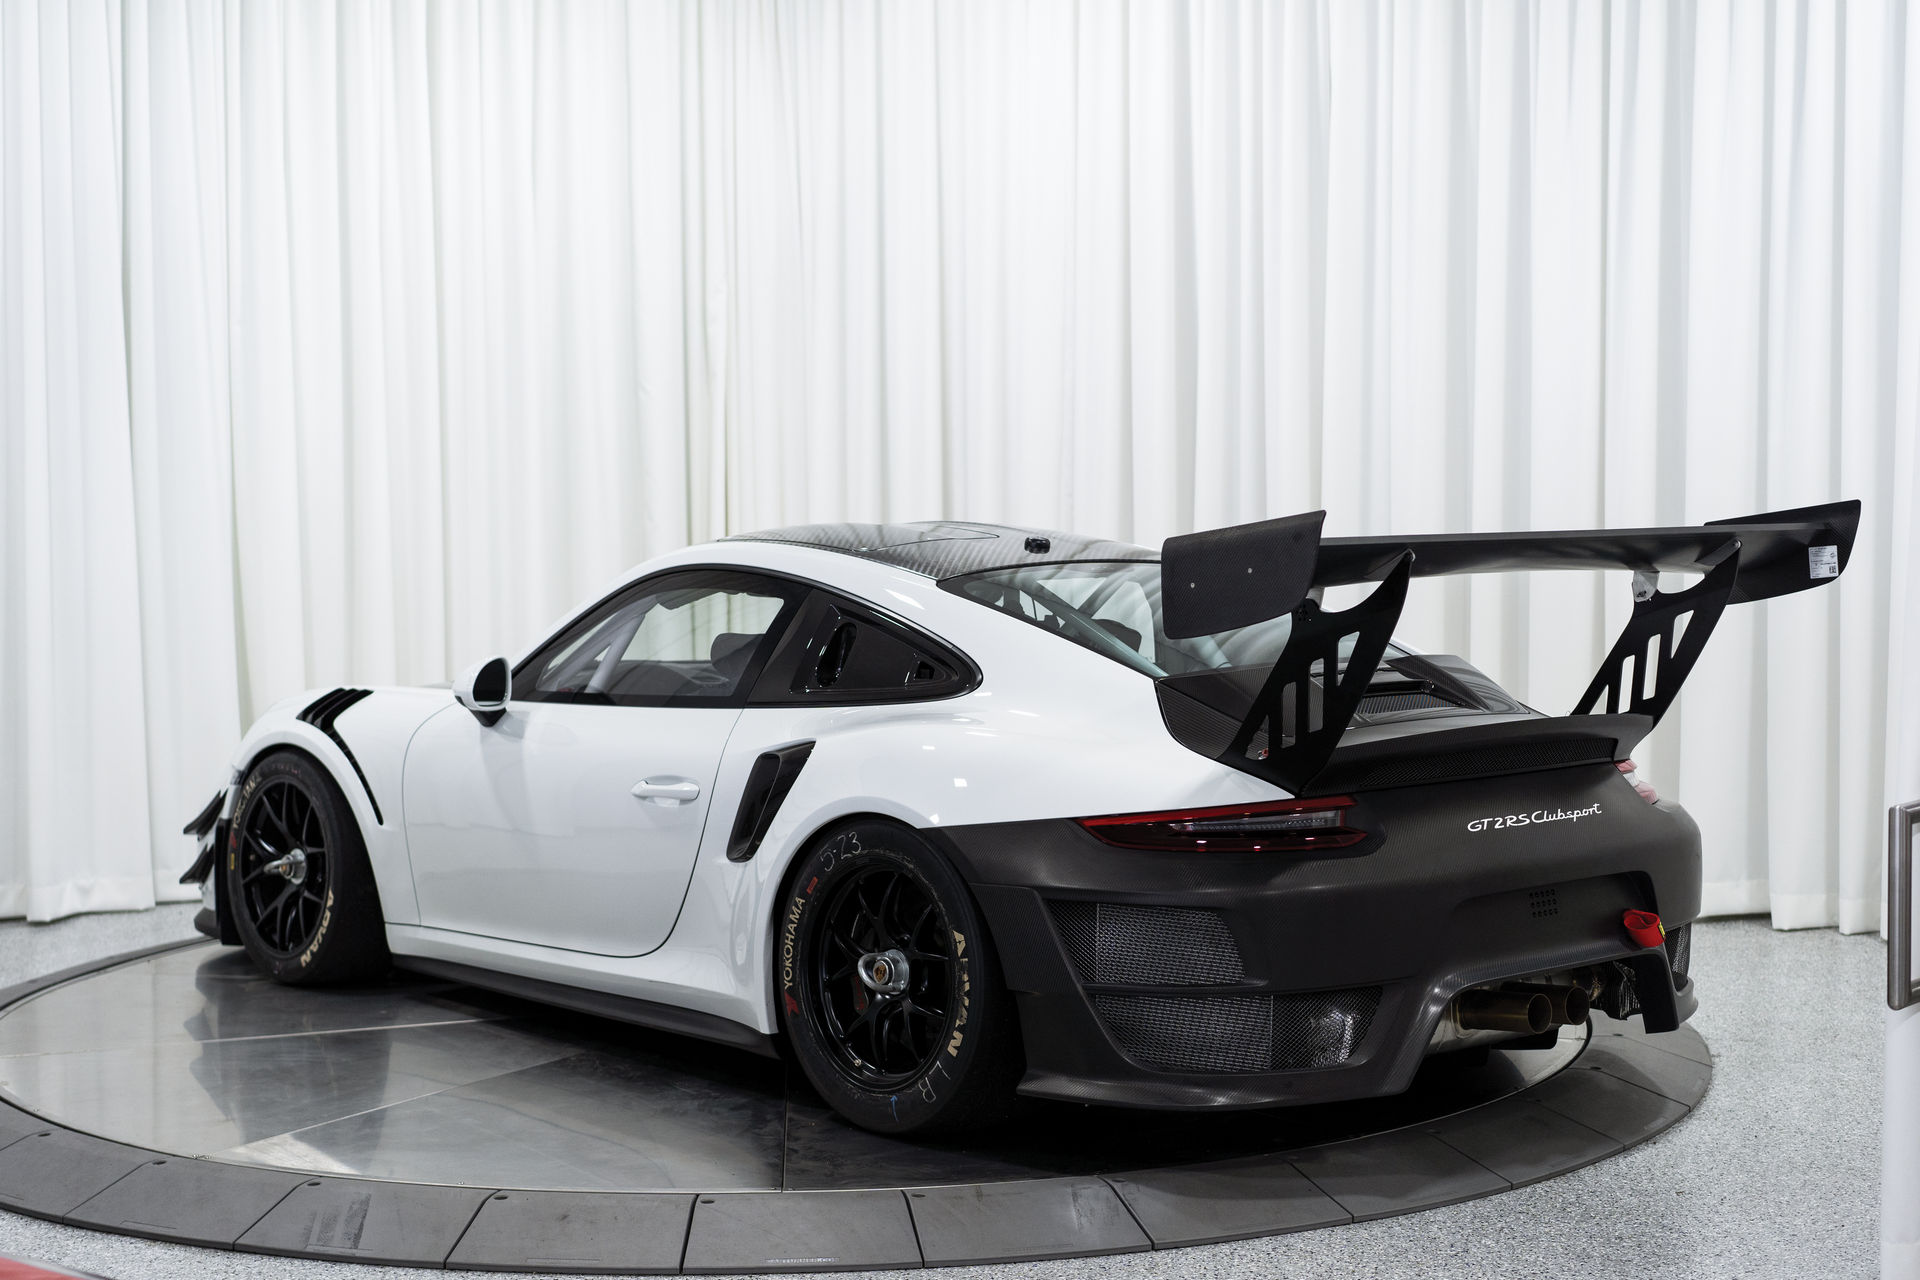 Porsche-911-GT2-RS-Clubsport-auction-5